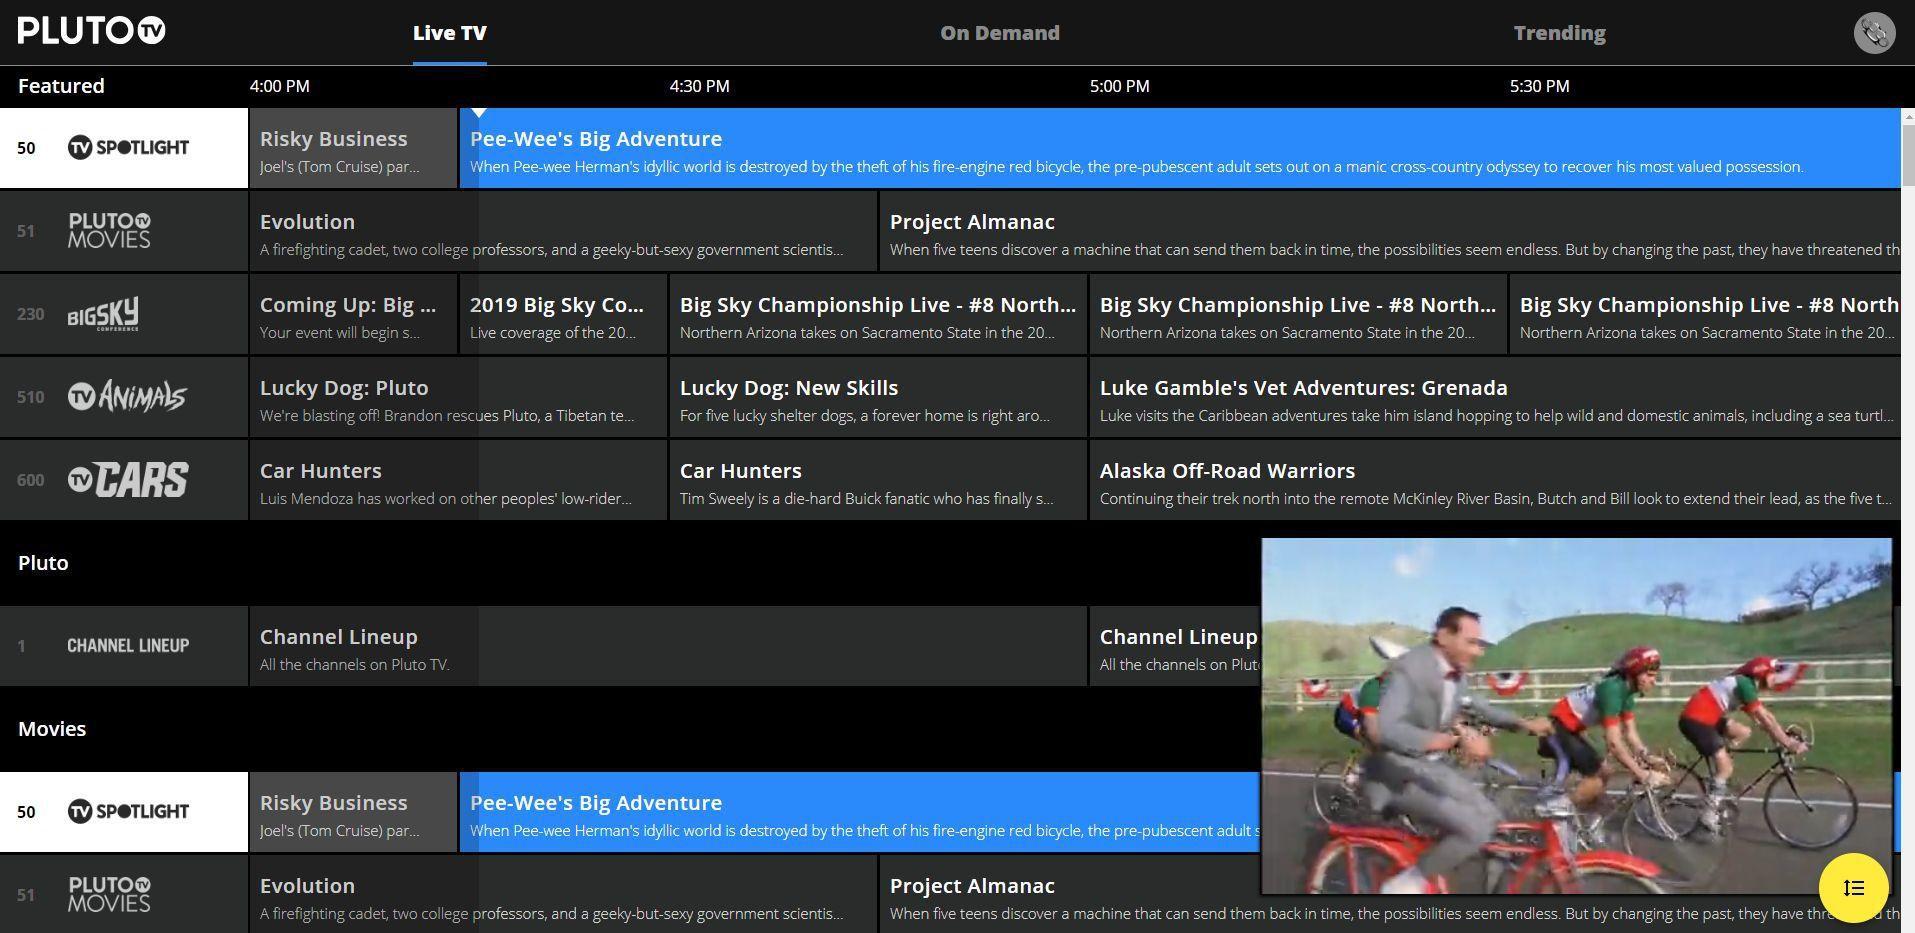 pluto-tv-live-tv-guide